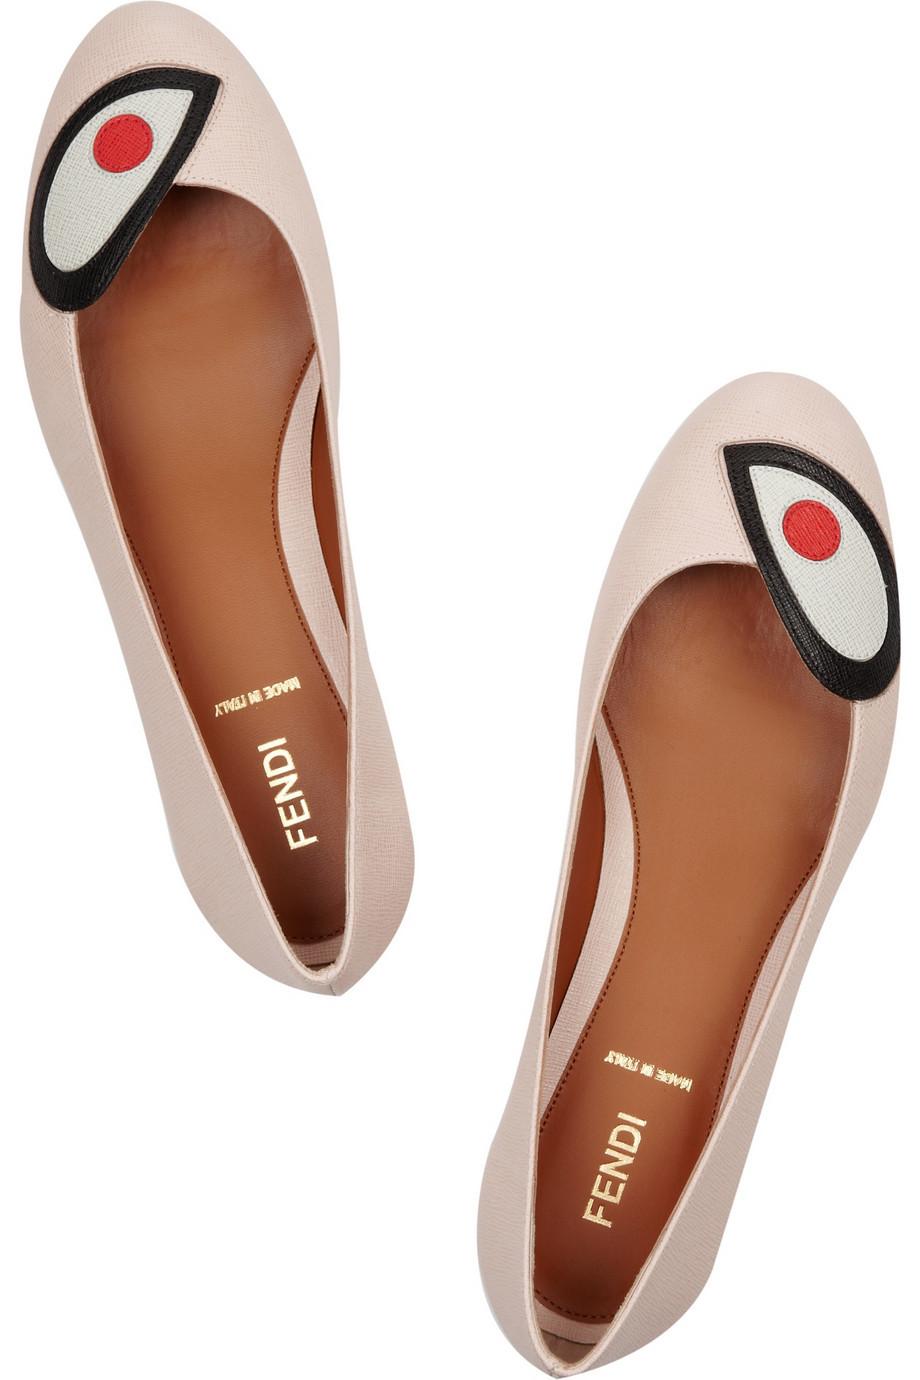 shoelust:  Fendi Cartoon Eye flats